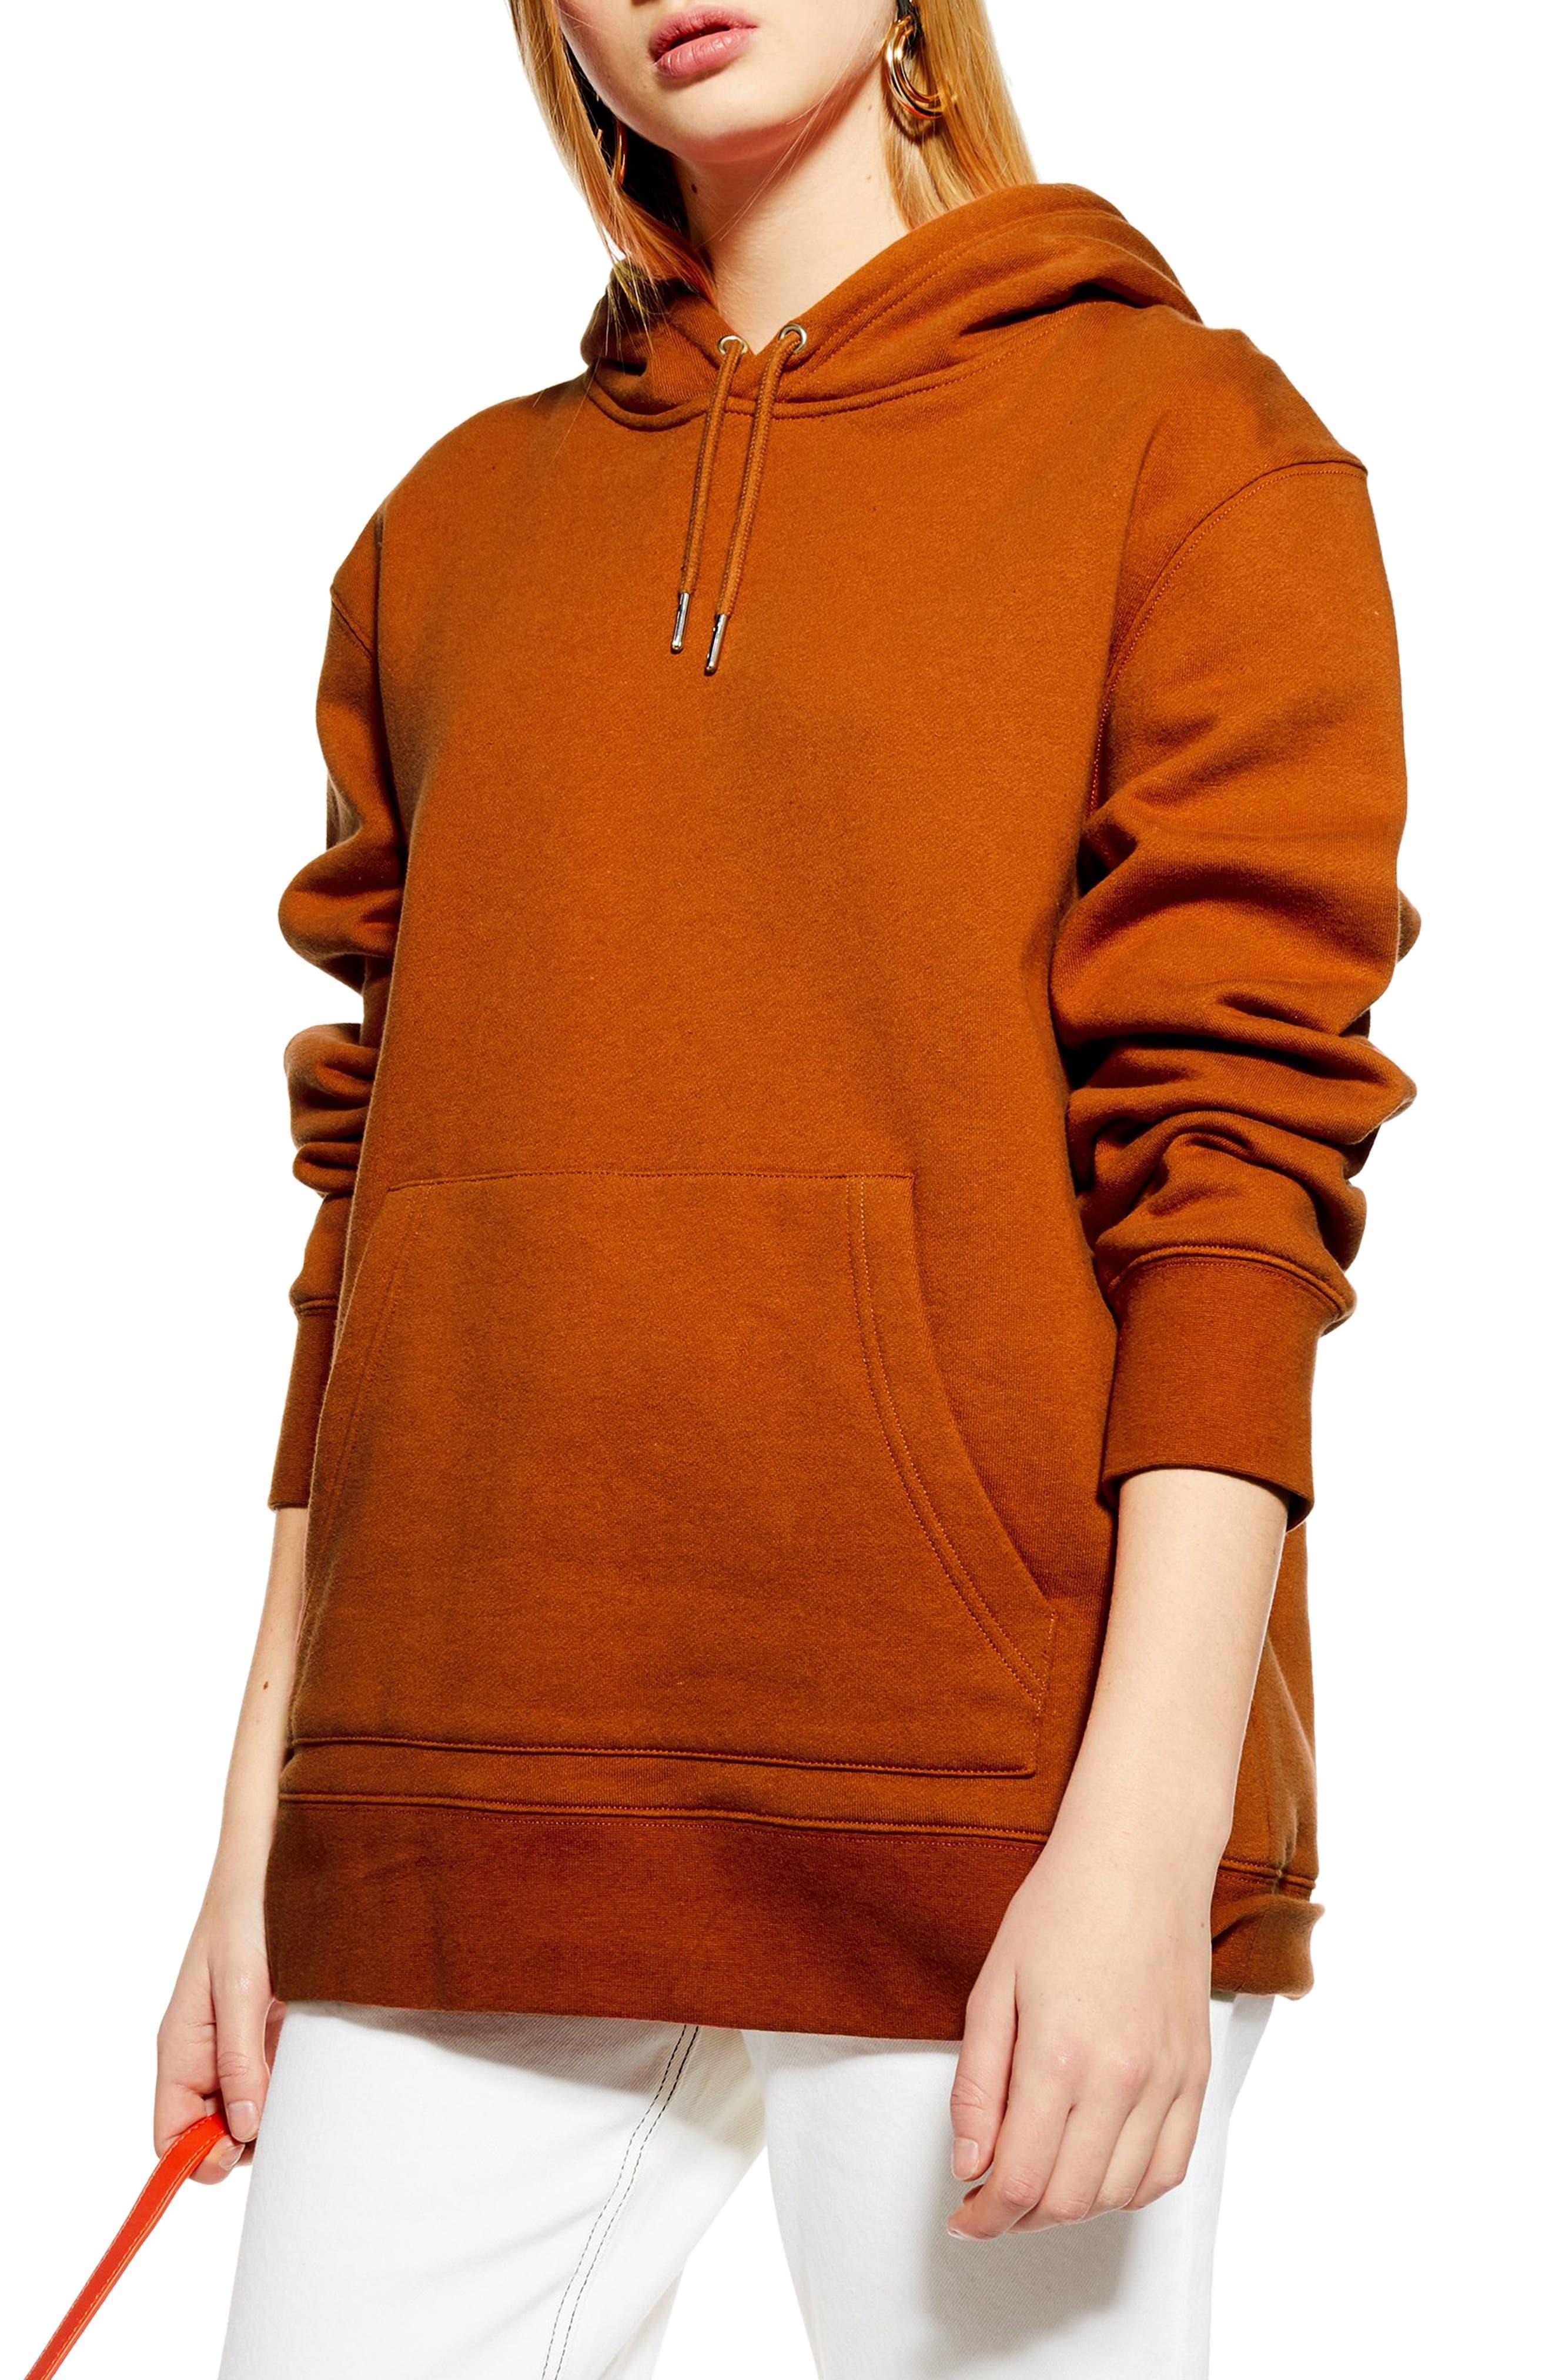 TOPSHOP, Relaxed Hooded Sweatshirt, Main thumbnail 1, color, RUST